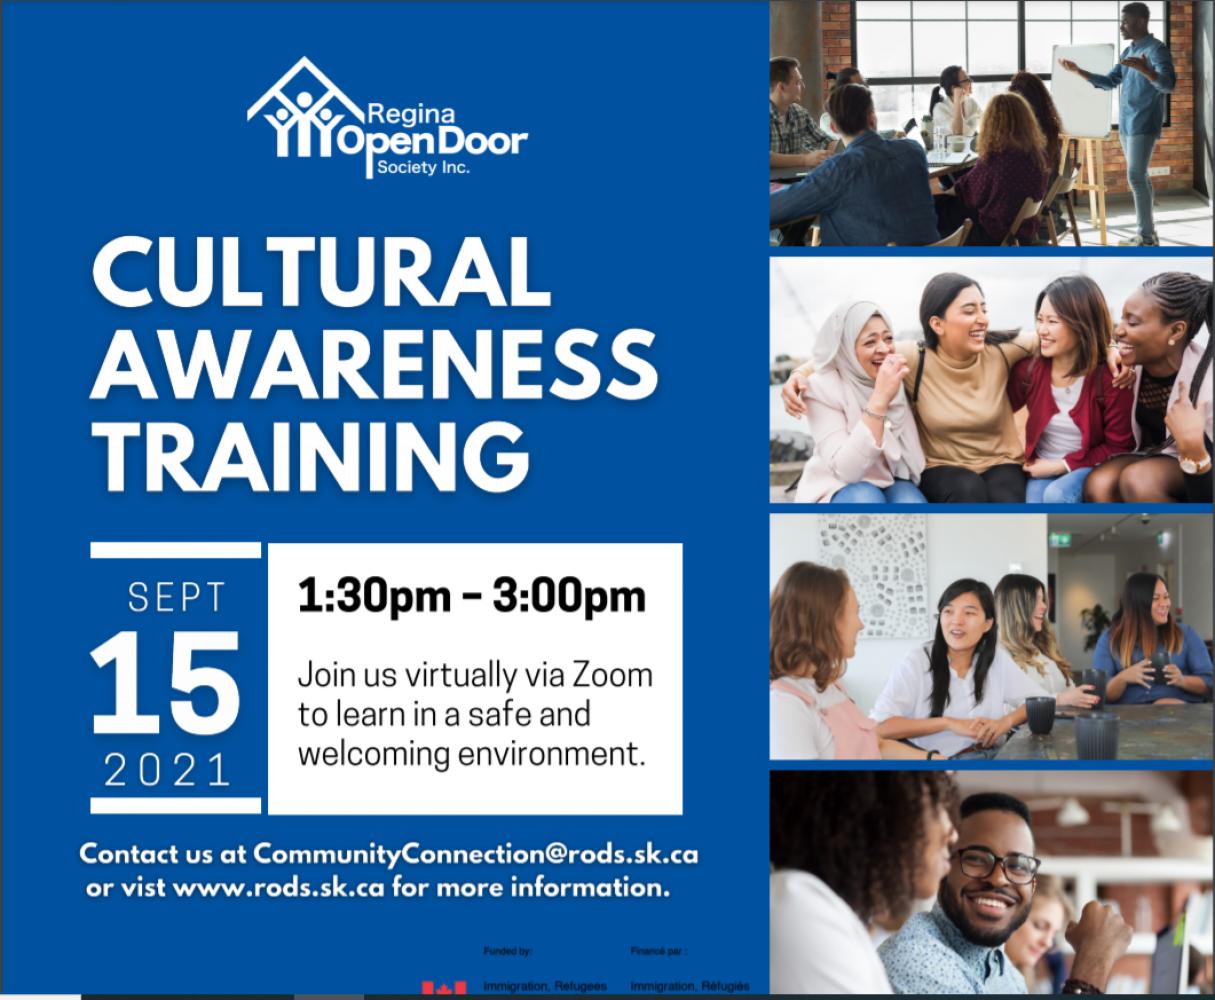 Free Cultural Awareness Training - Sept 15!  Register now!